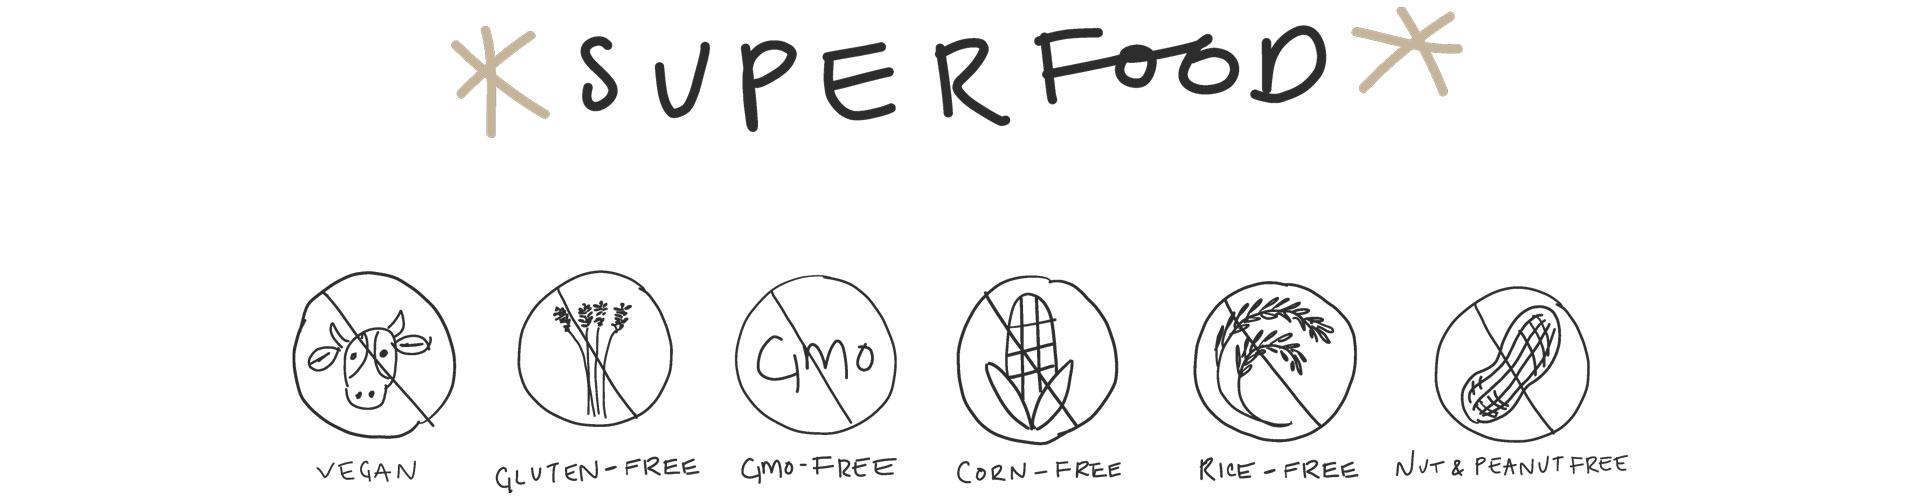 daughtercreative_gaby_noodi_superfood_logo.jpg